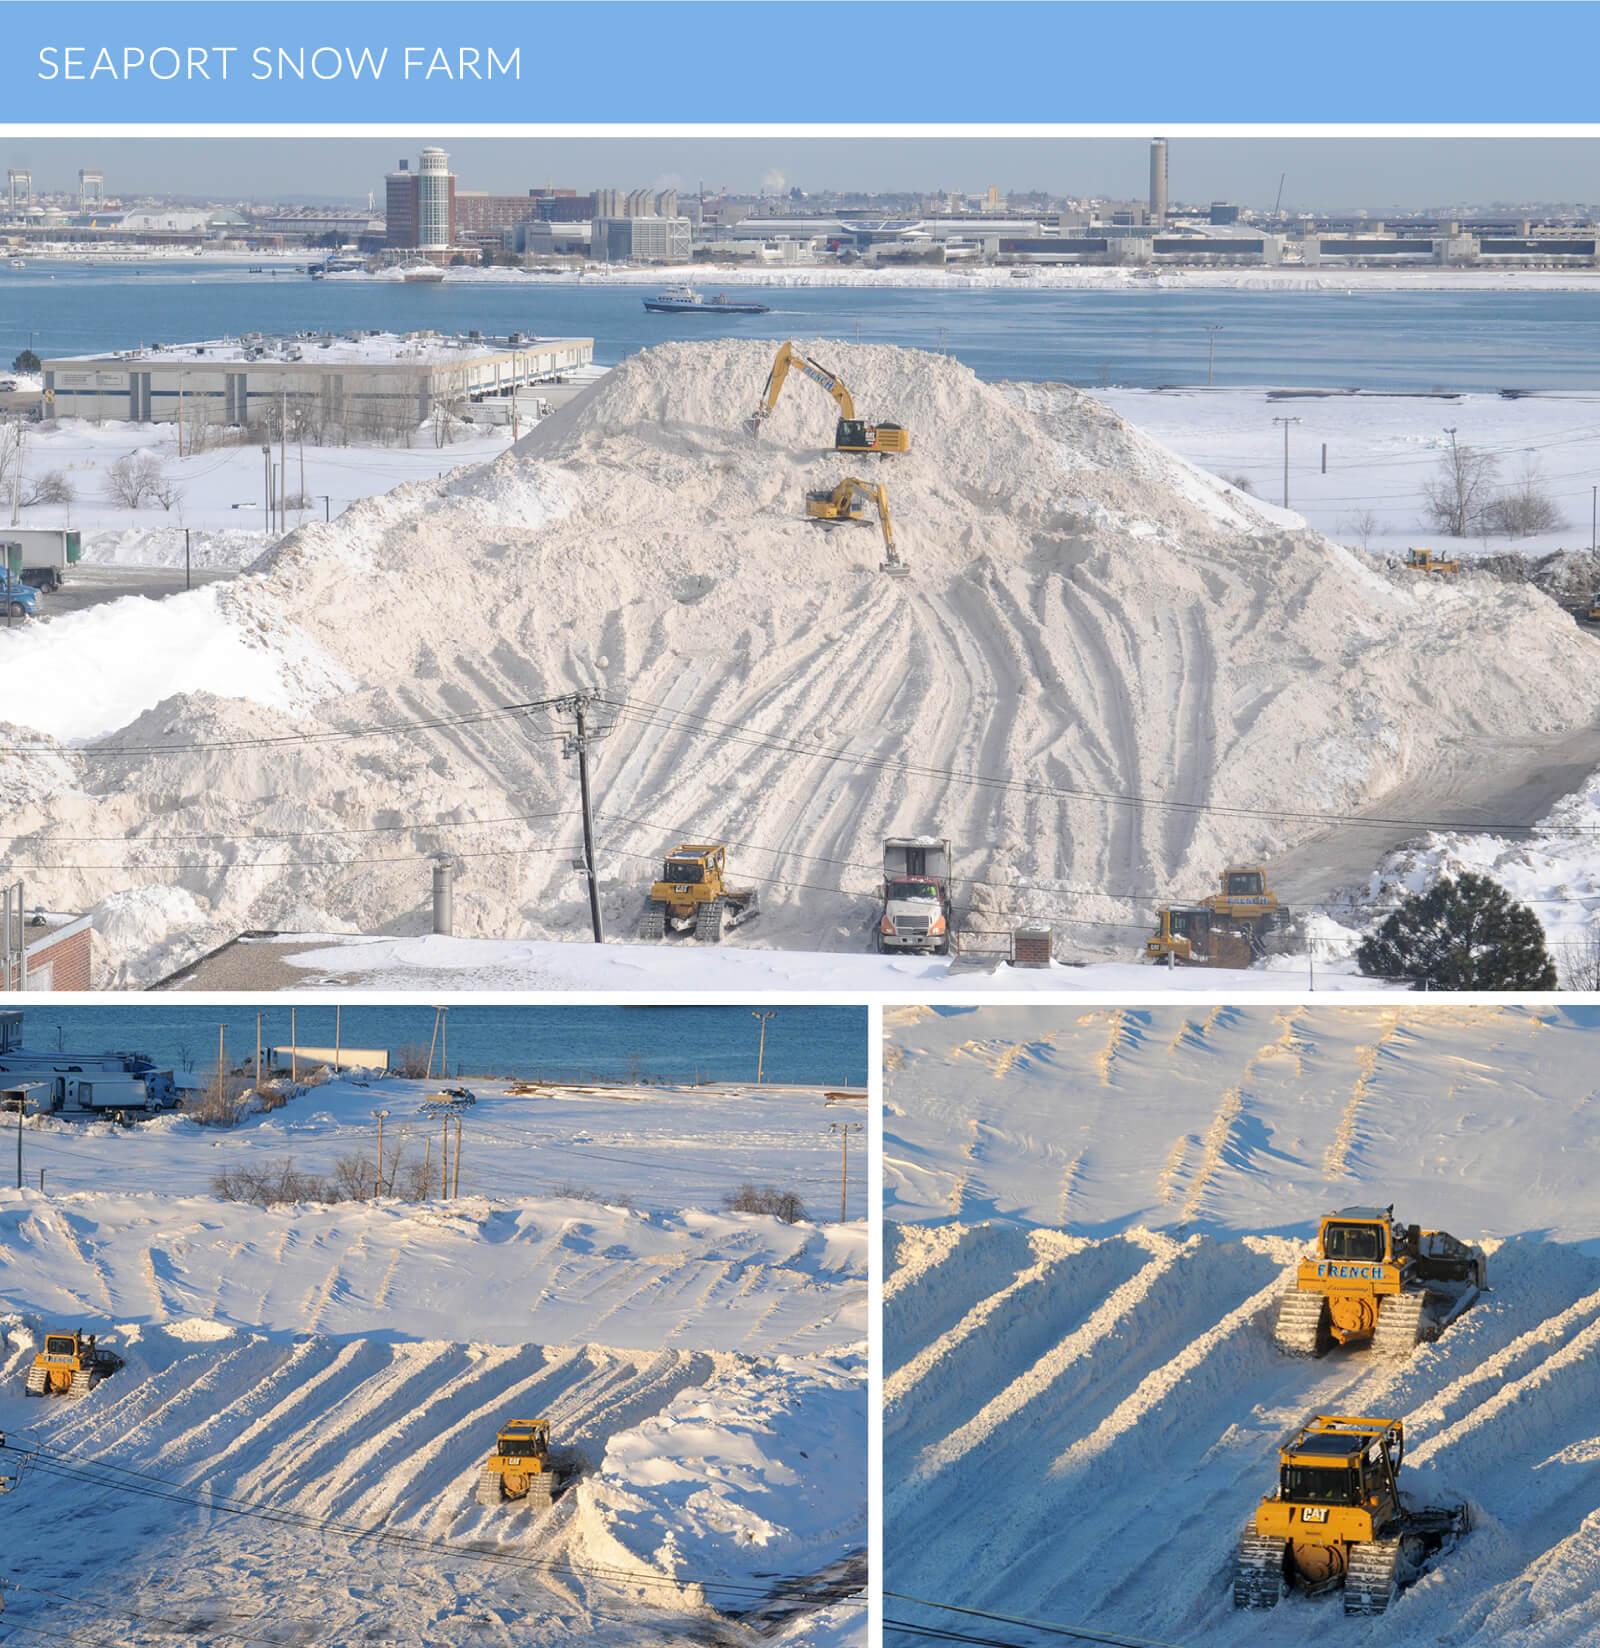 Seaport Snow Farm